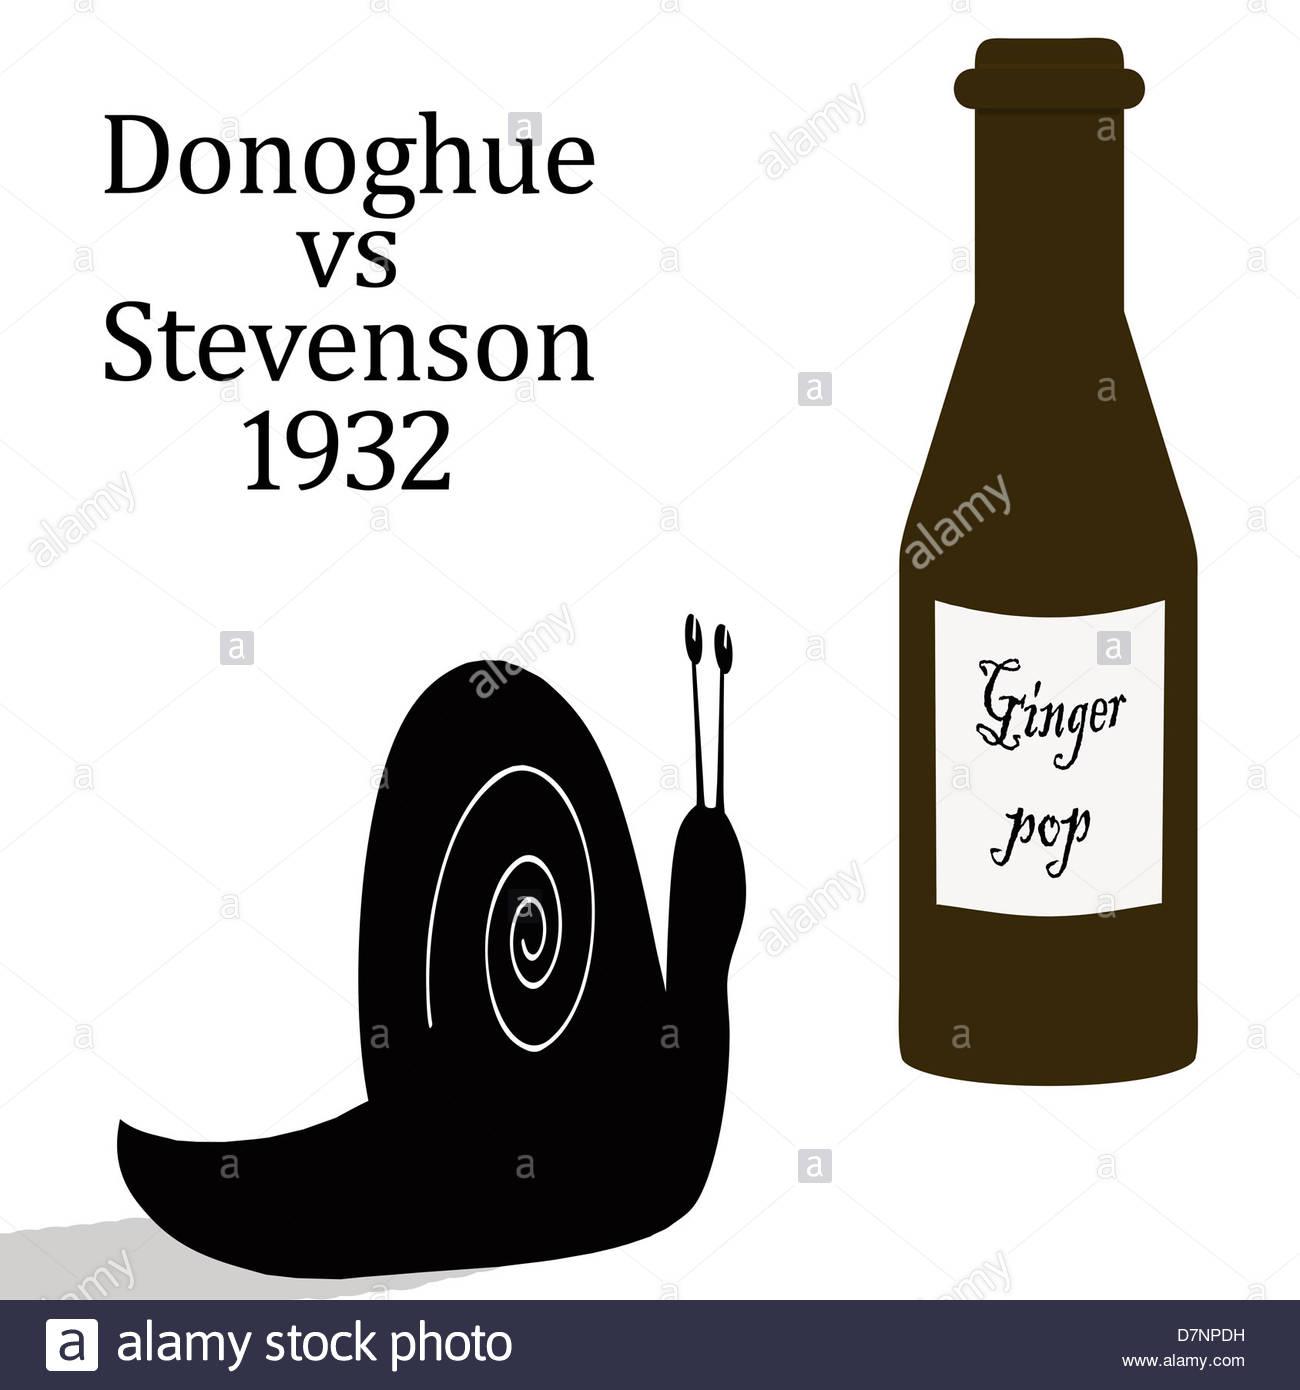 Digital Illustration - Donoghue v Stevenson [1932] A landmark case showing that manufacturers have a duty of care. Stock Photo